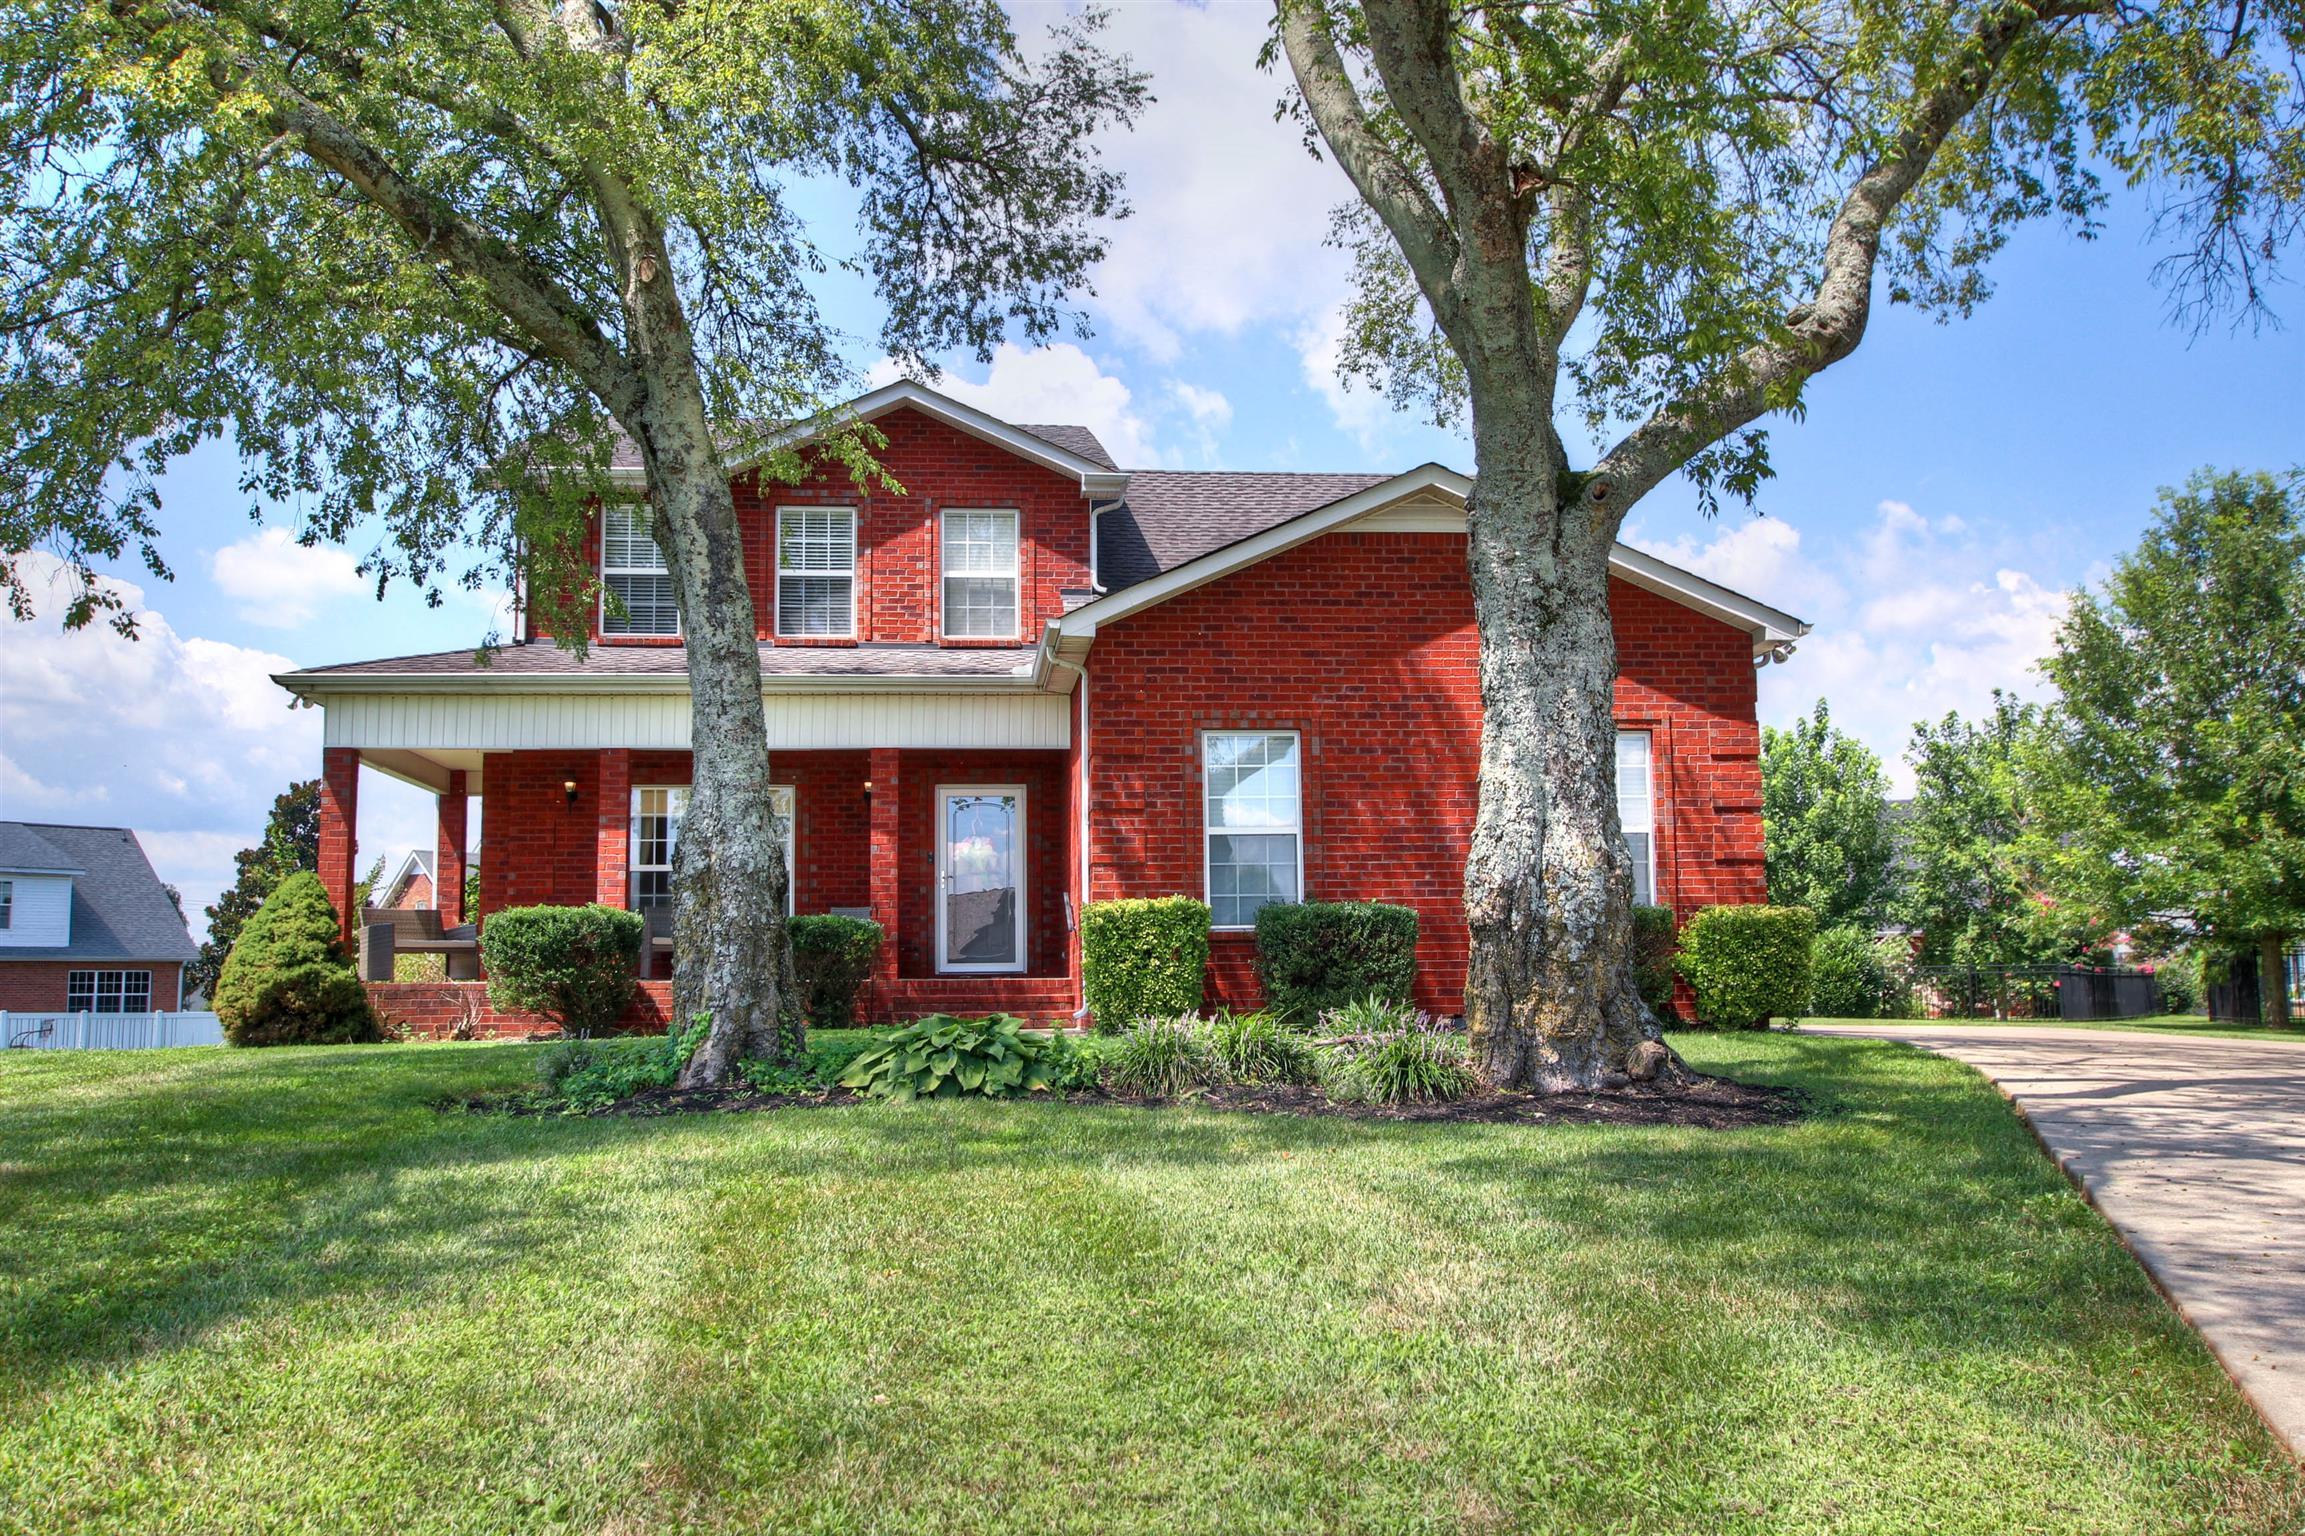 5233 Old Glory Ct, Murfreesboro, TN 37129 - Murfreesboro, TN real estate listing